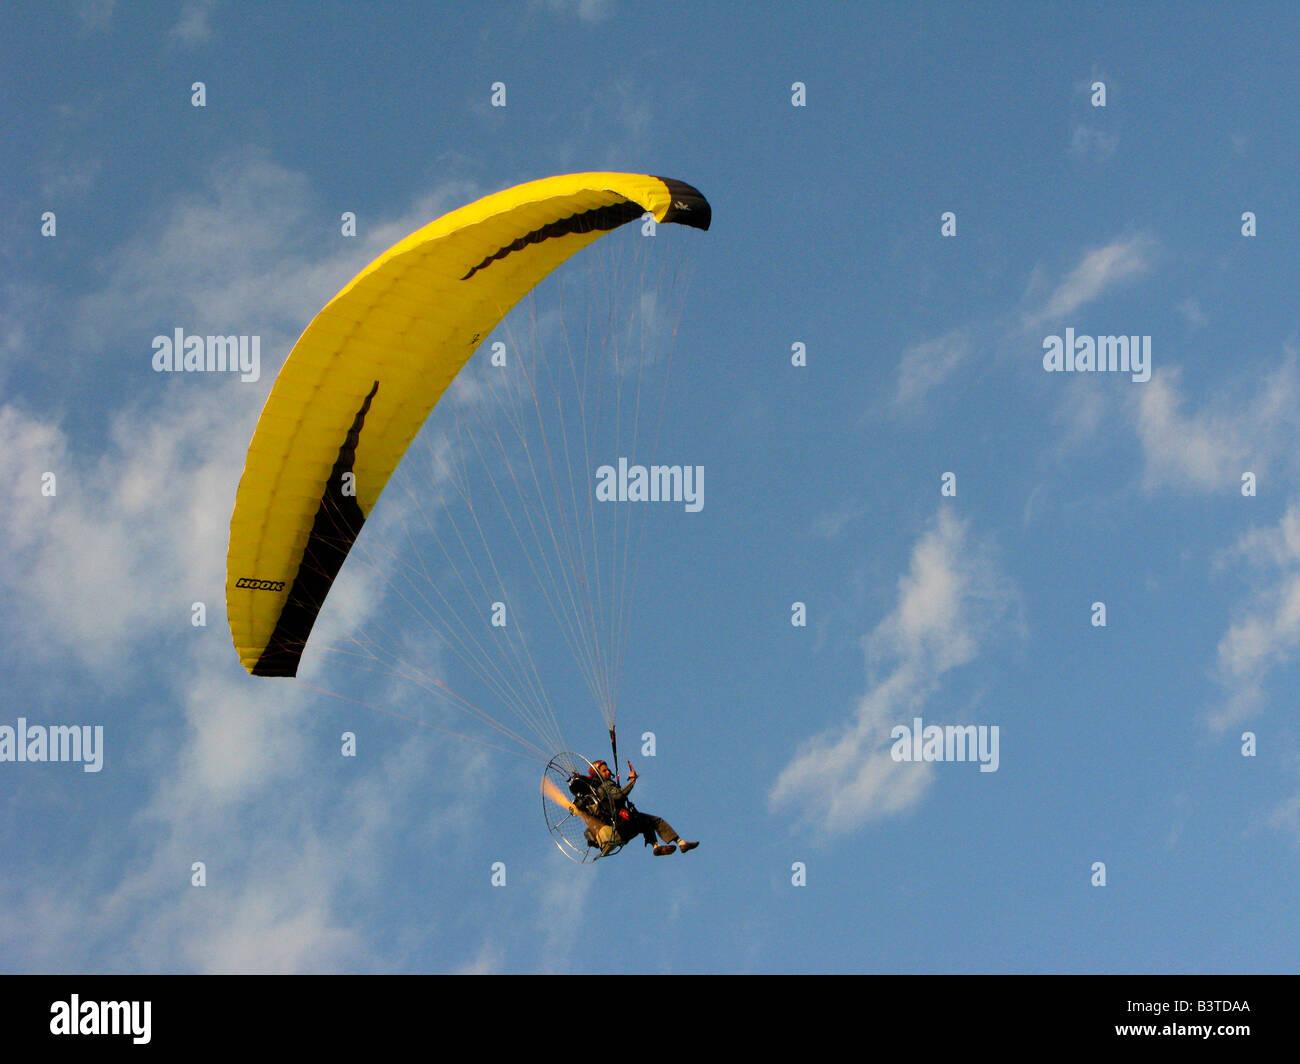 motor glider powered paraglider - Stock Image